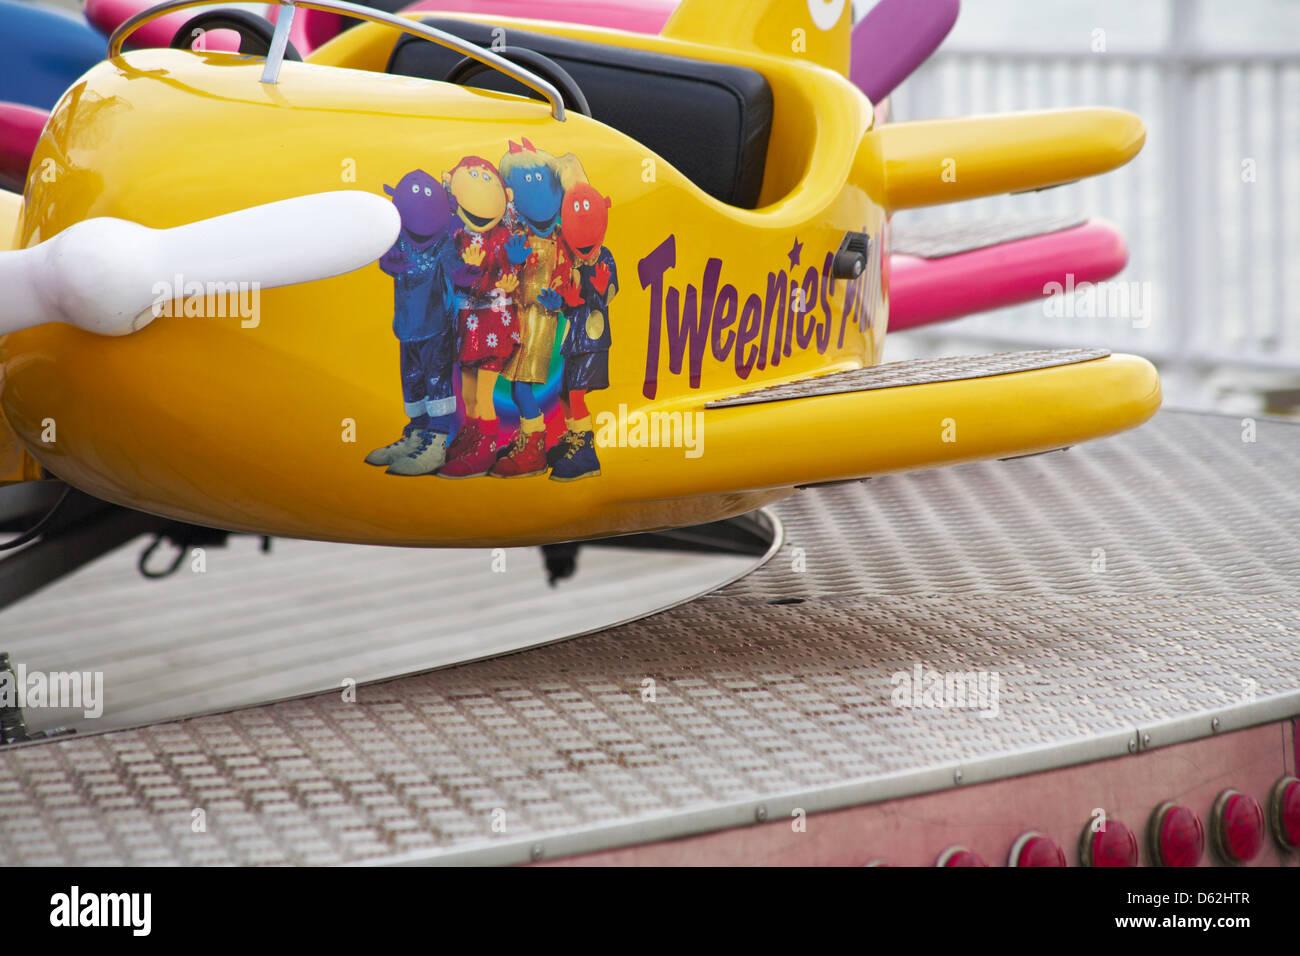 Tweenies fairground ride on Bournemouth Pier in March - Stock Image